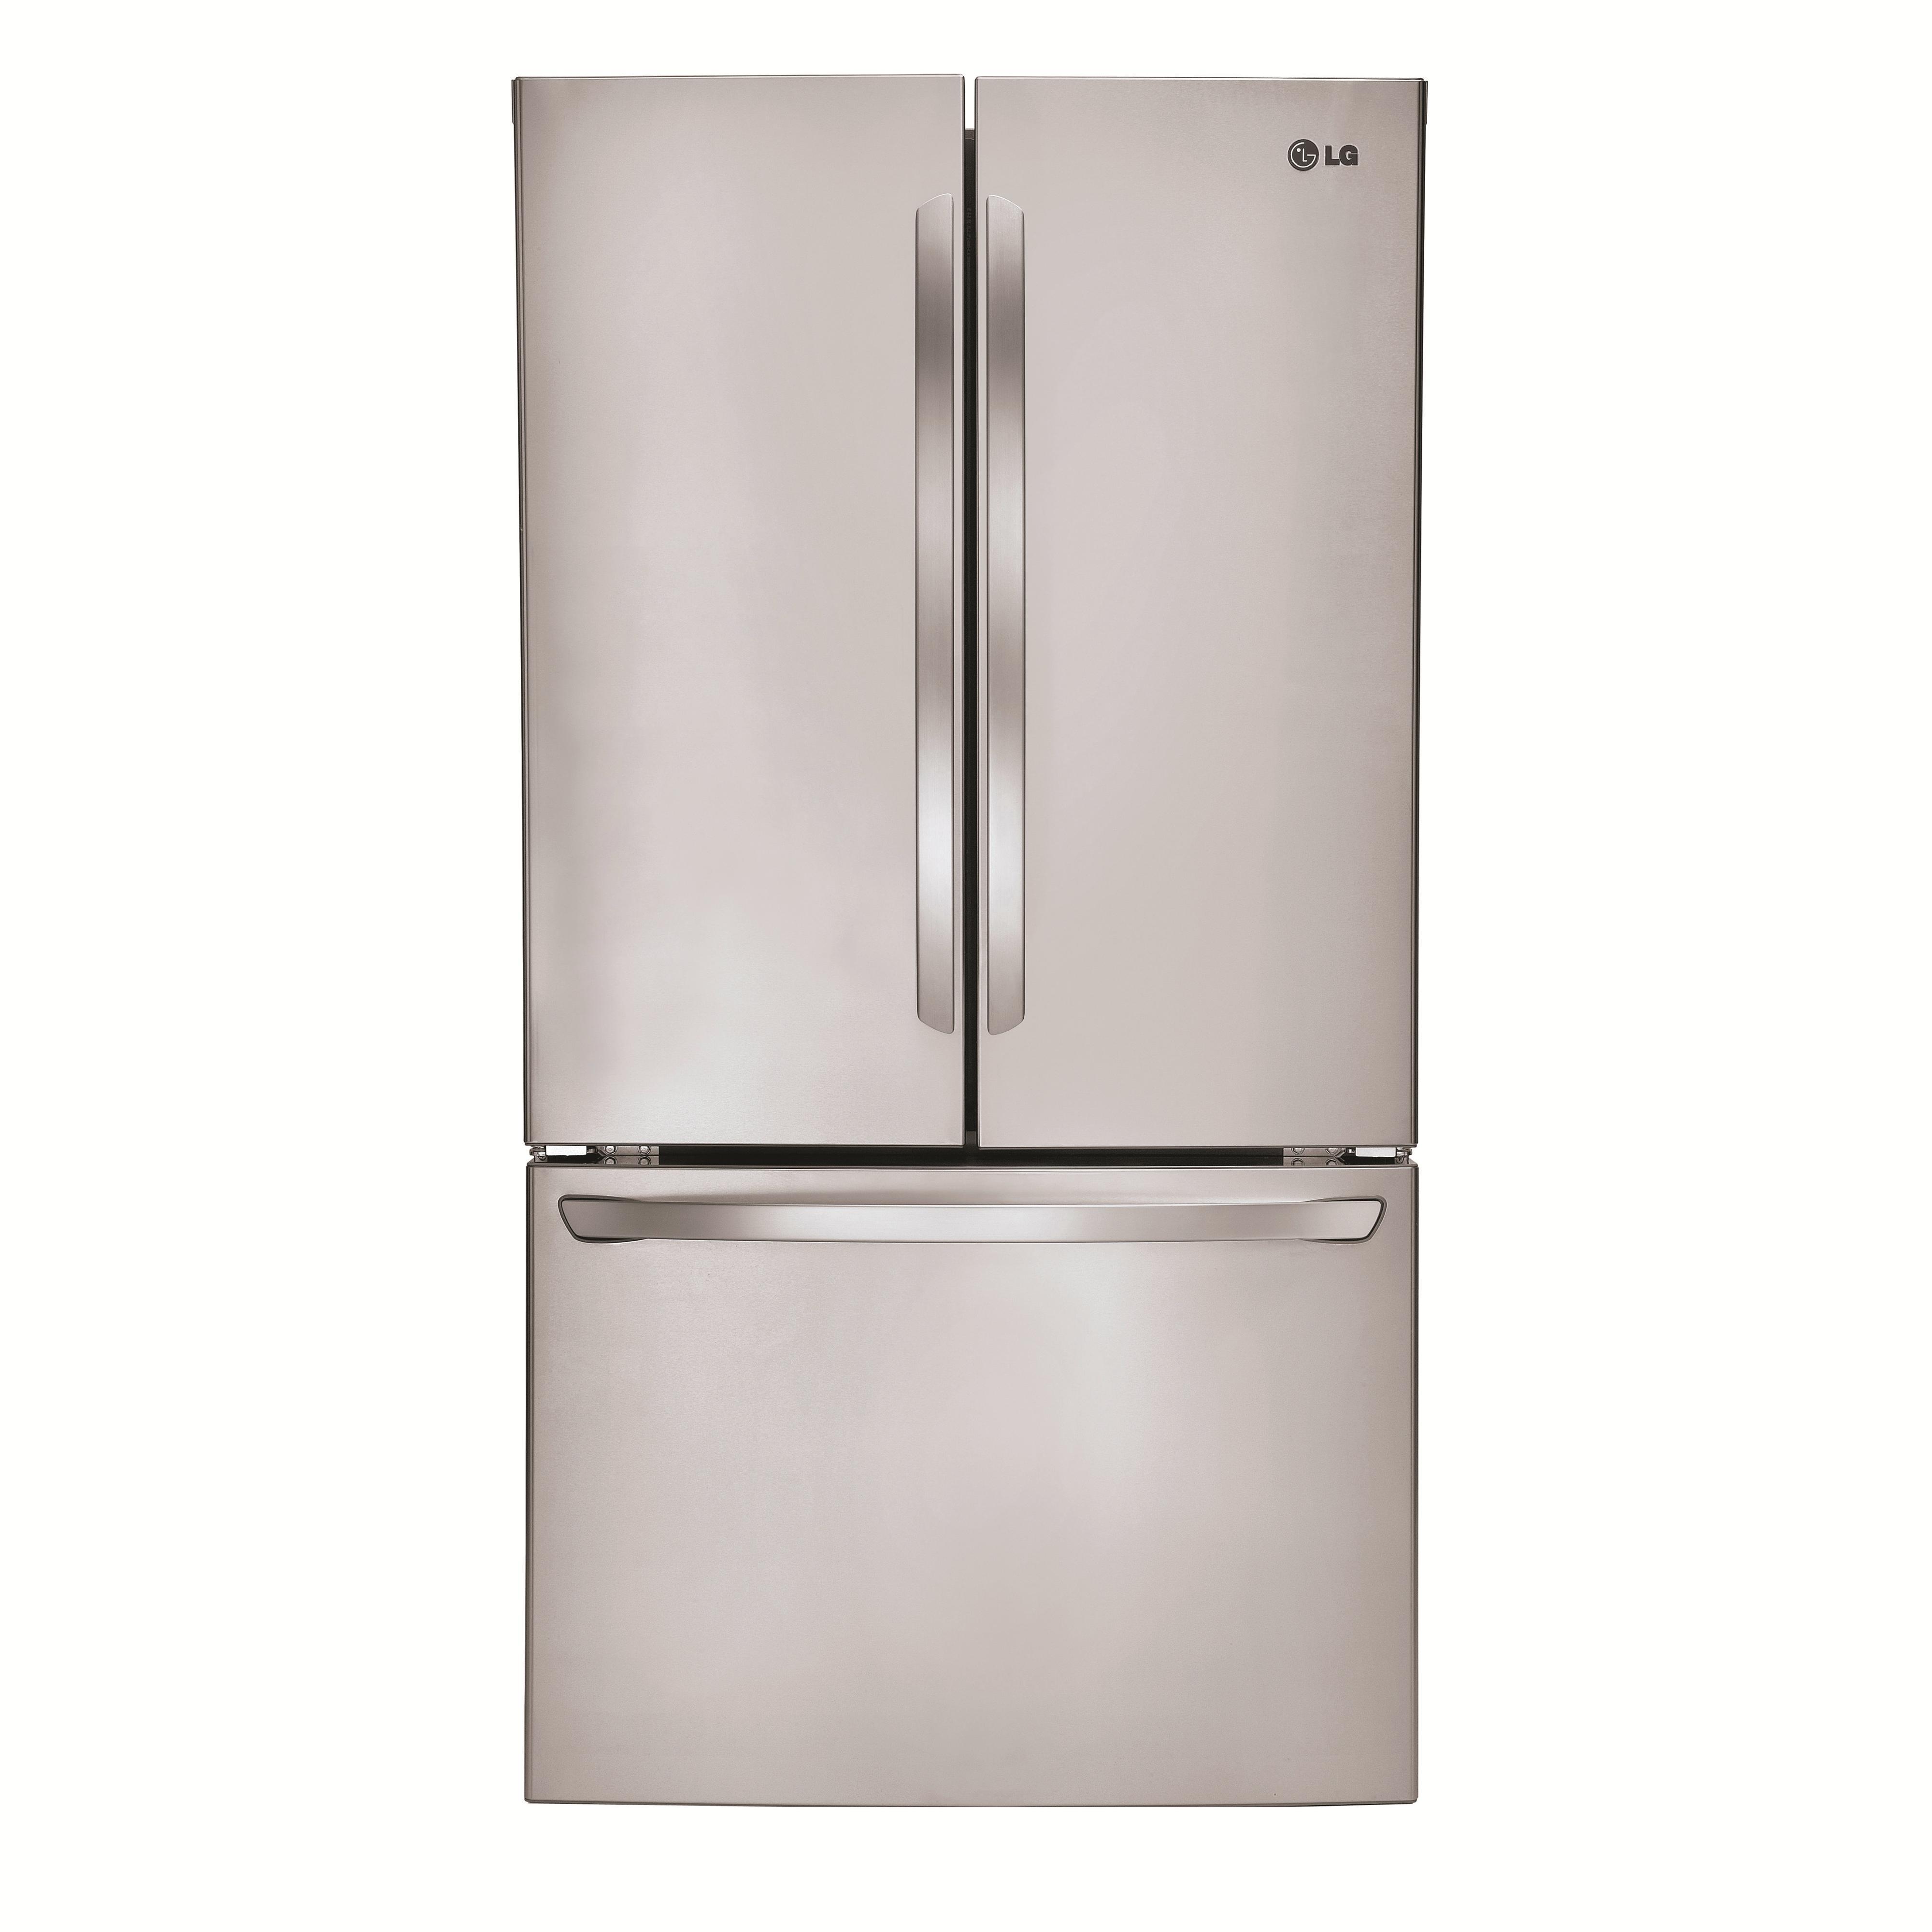 LG Appliances French Door Refrigerators 31 Cu. Ft. French Door Refrigerator - Item Number: LFCS31626S